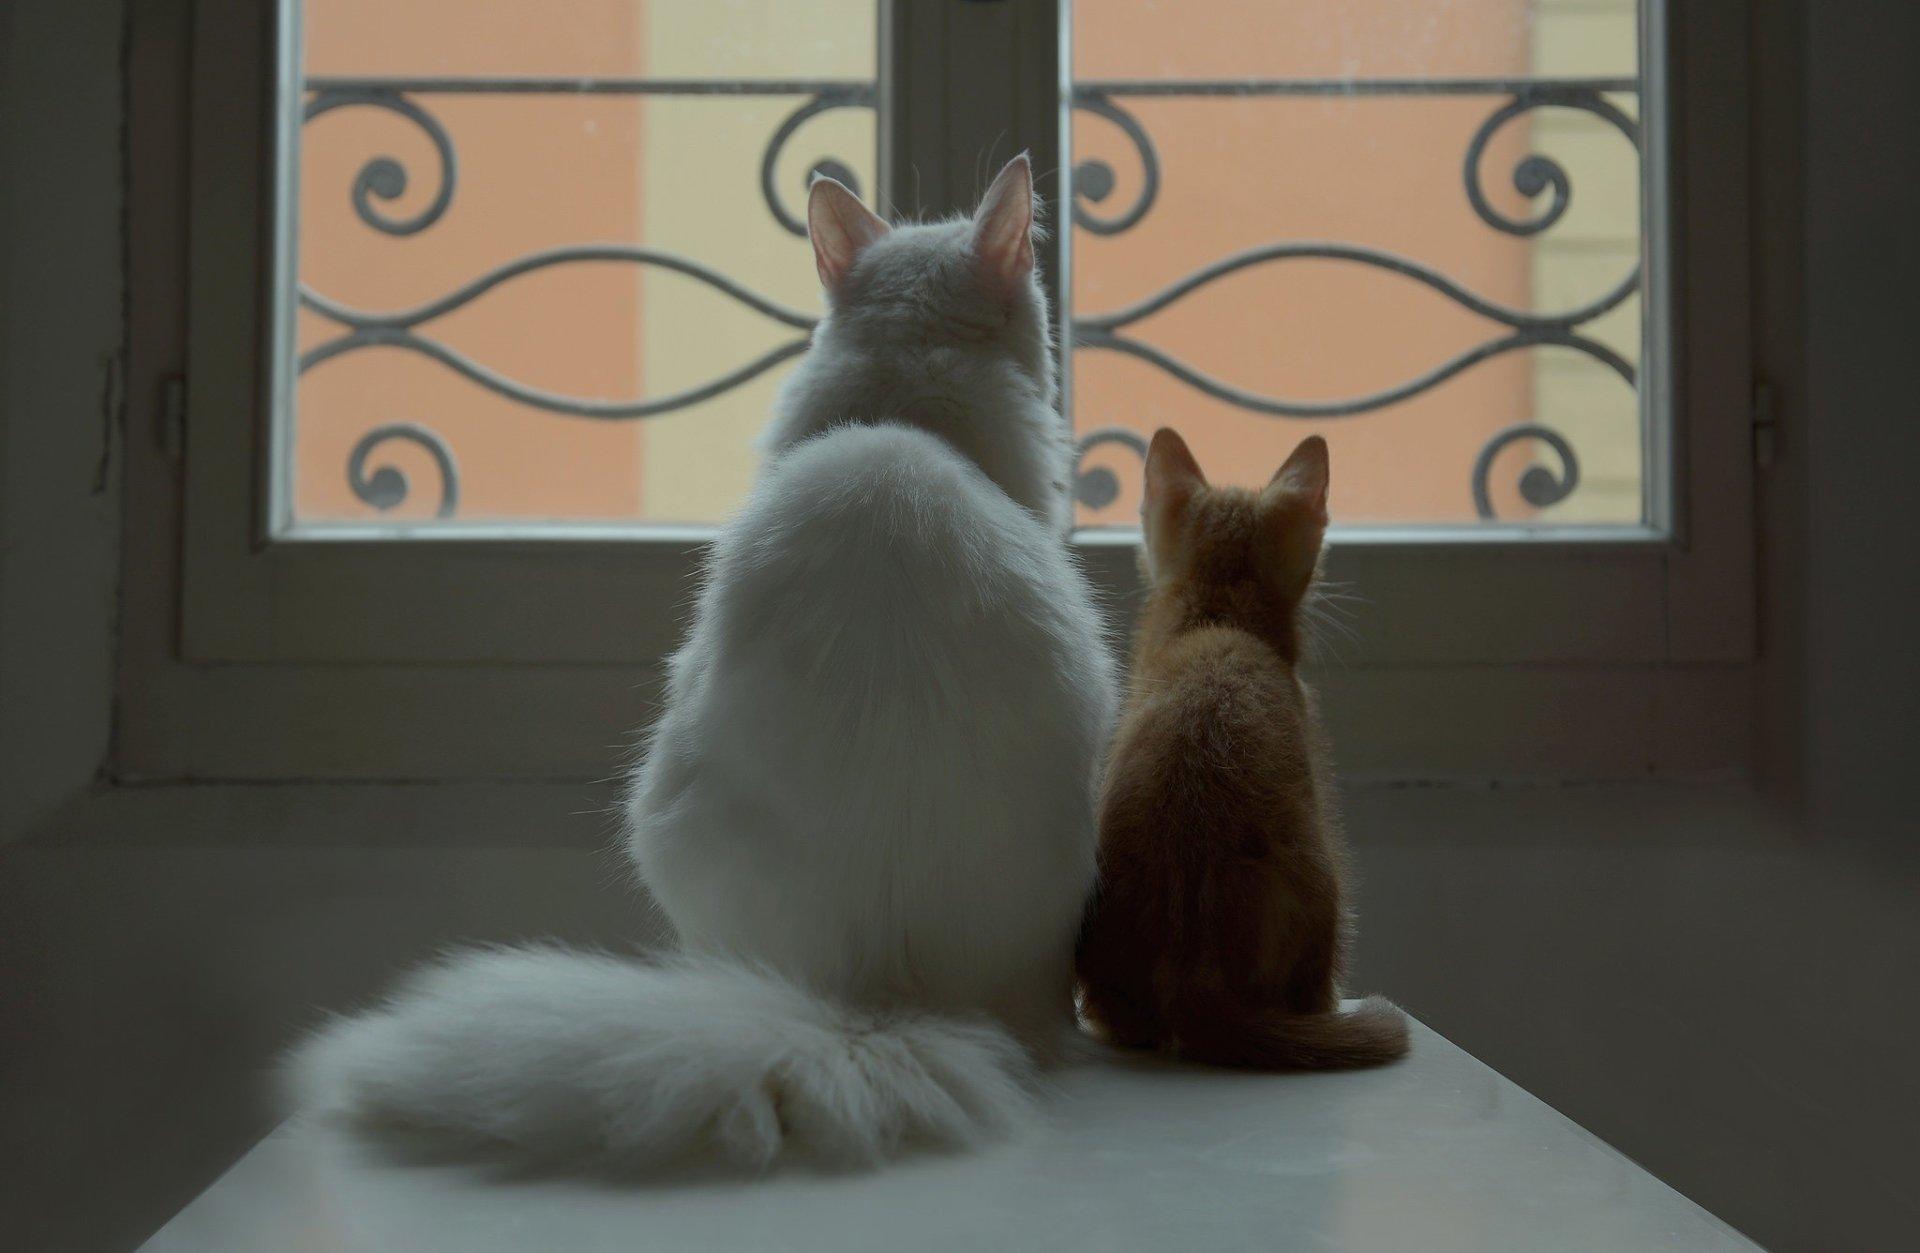 Animal - Cat  Table Kitten Window Wallpaper